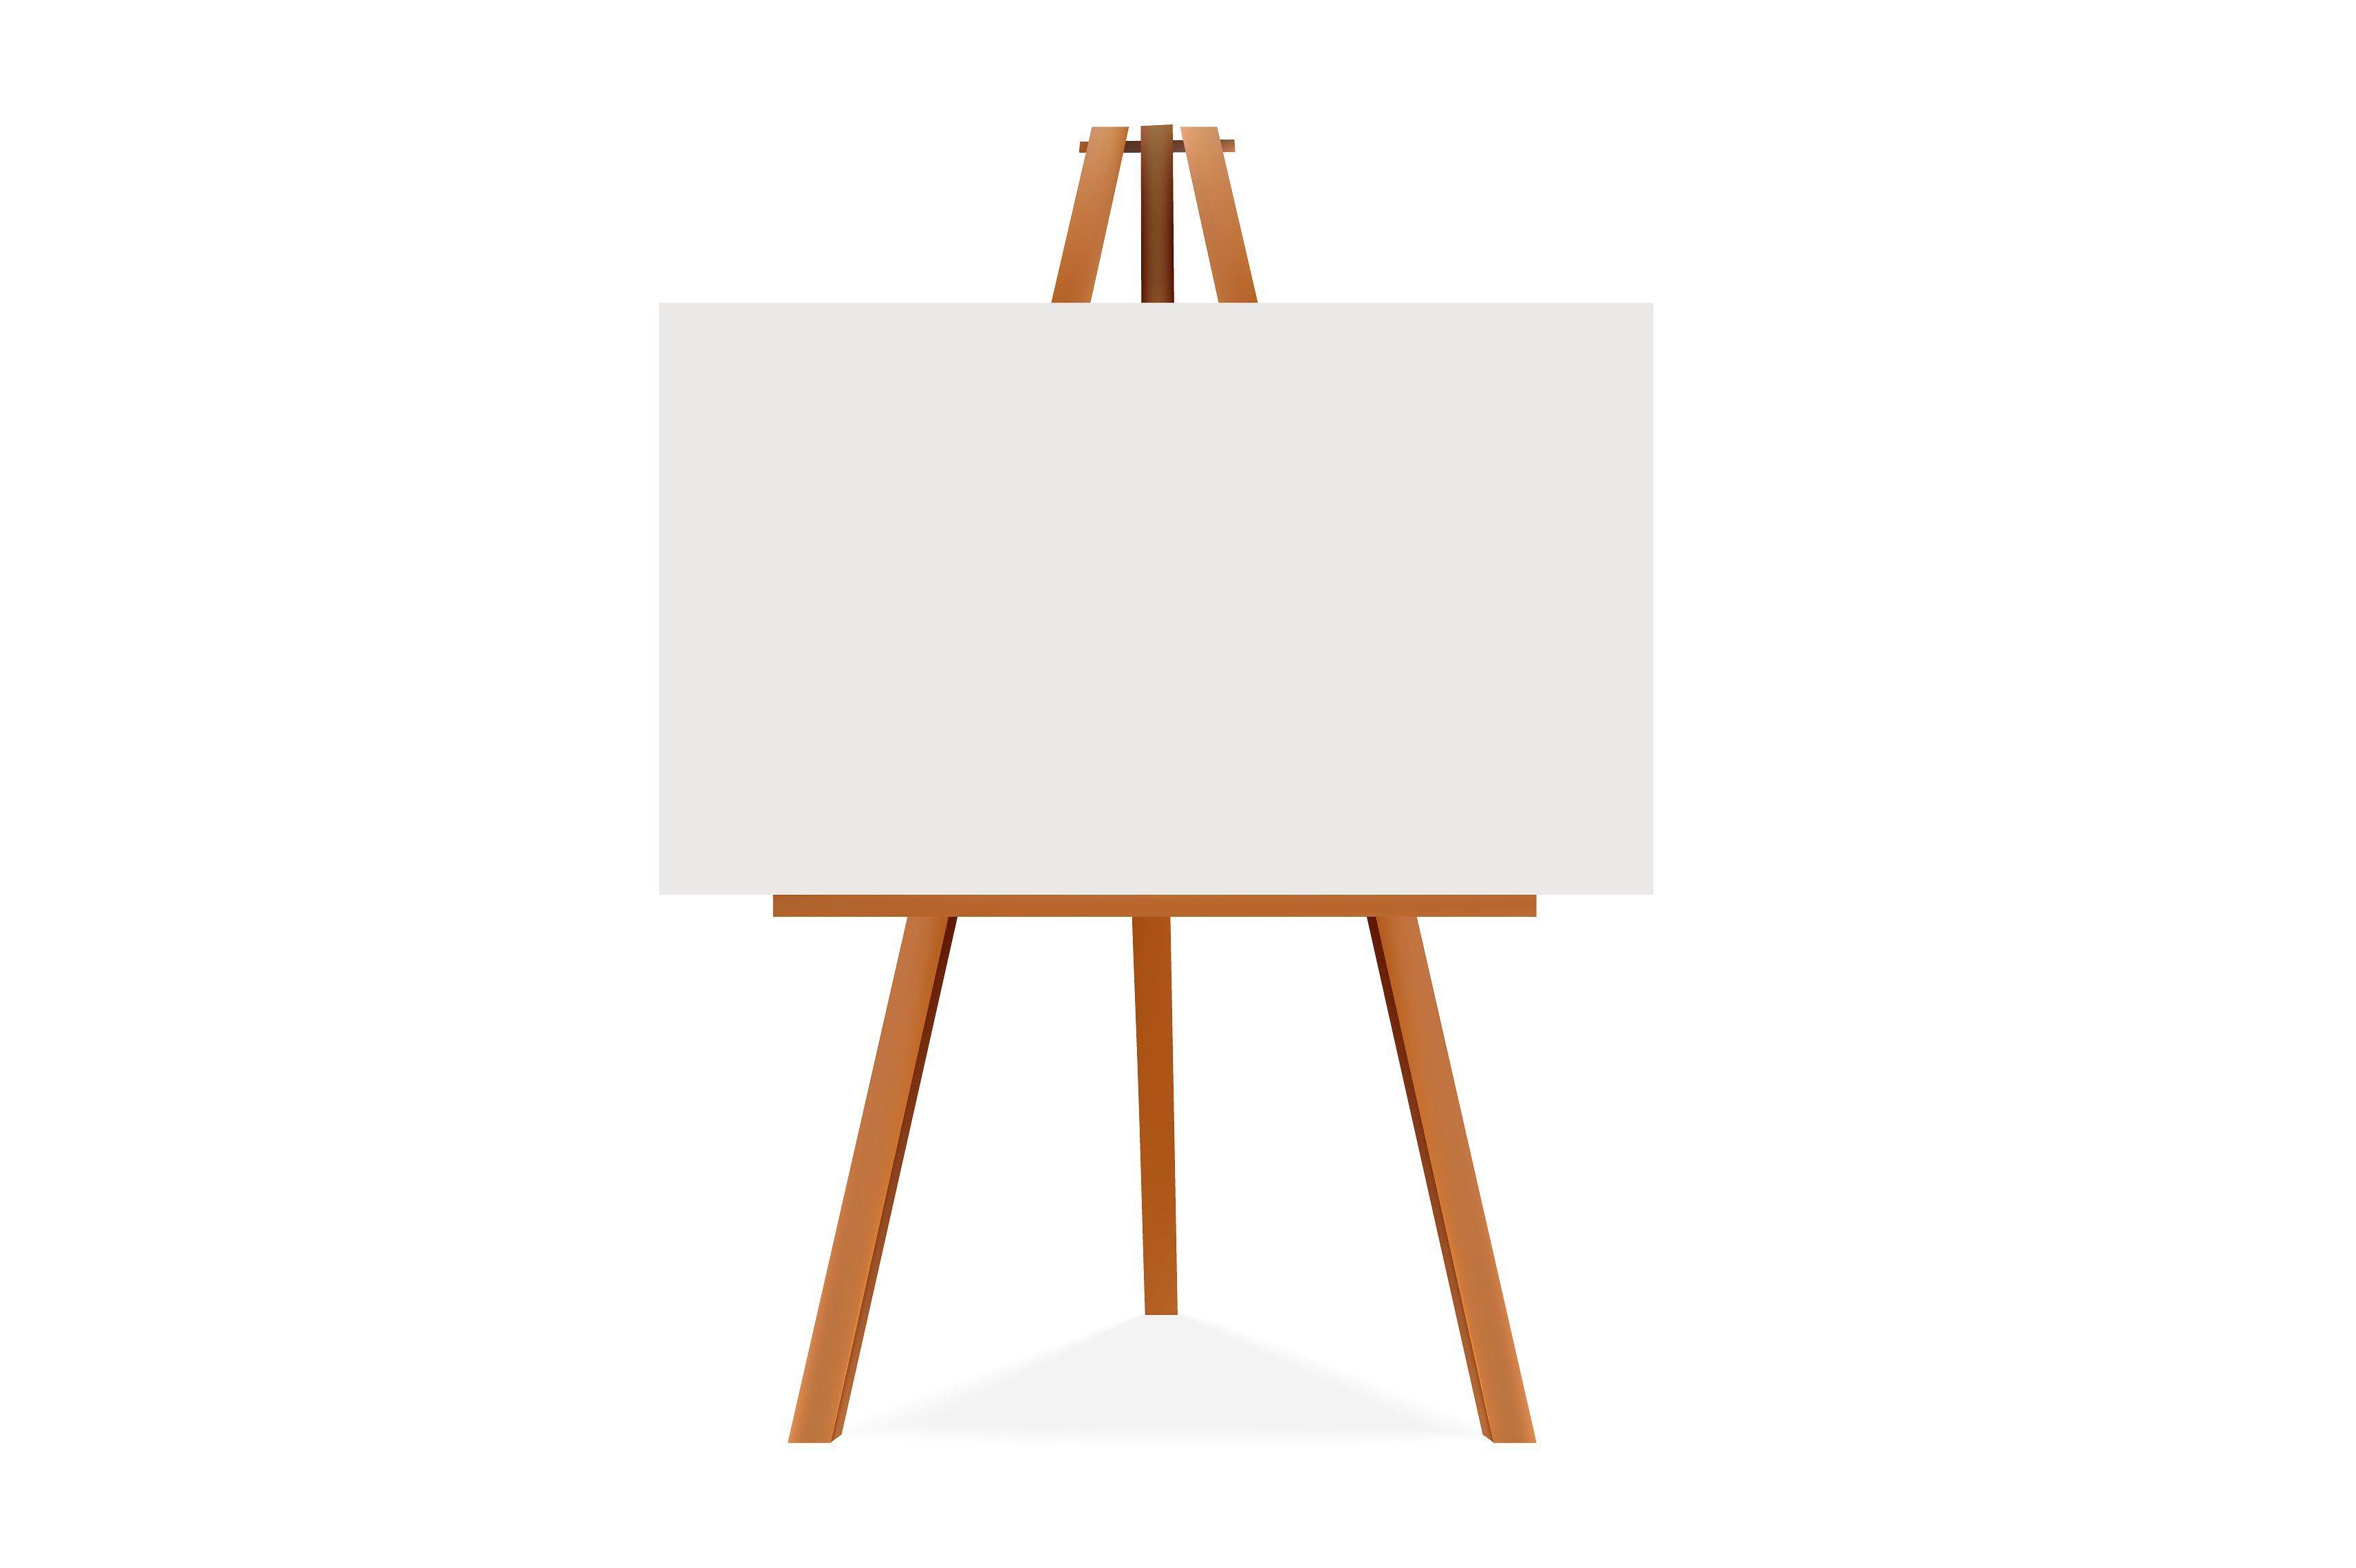 Easel Illustration Canvas Blank Space Wooden Adjustable Easel Art Easel Blank Photo